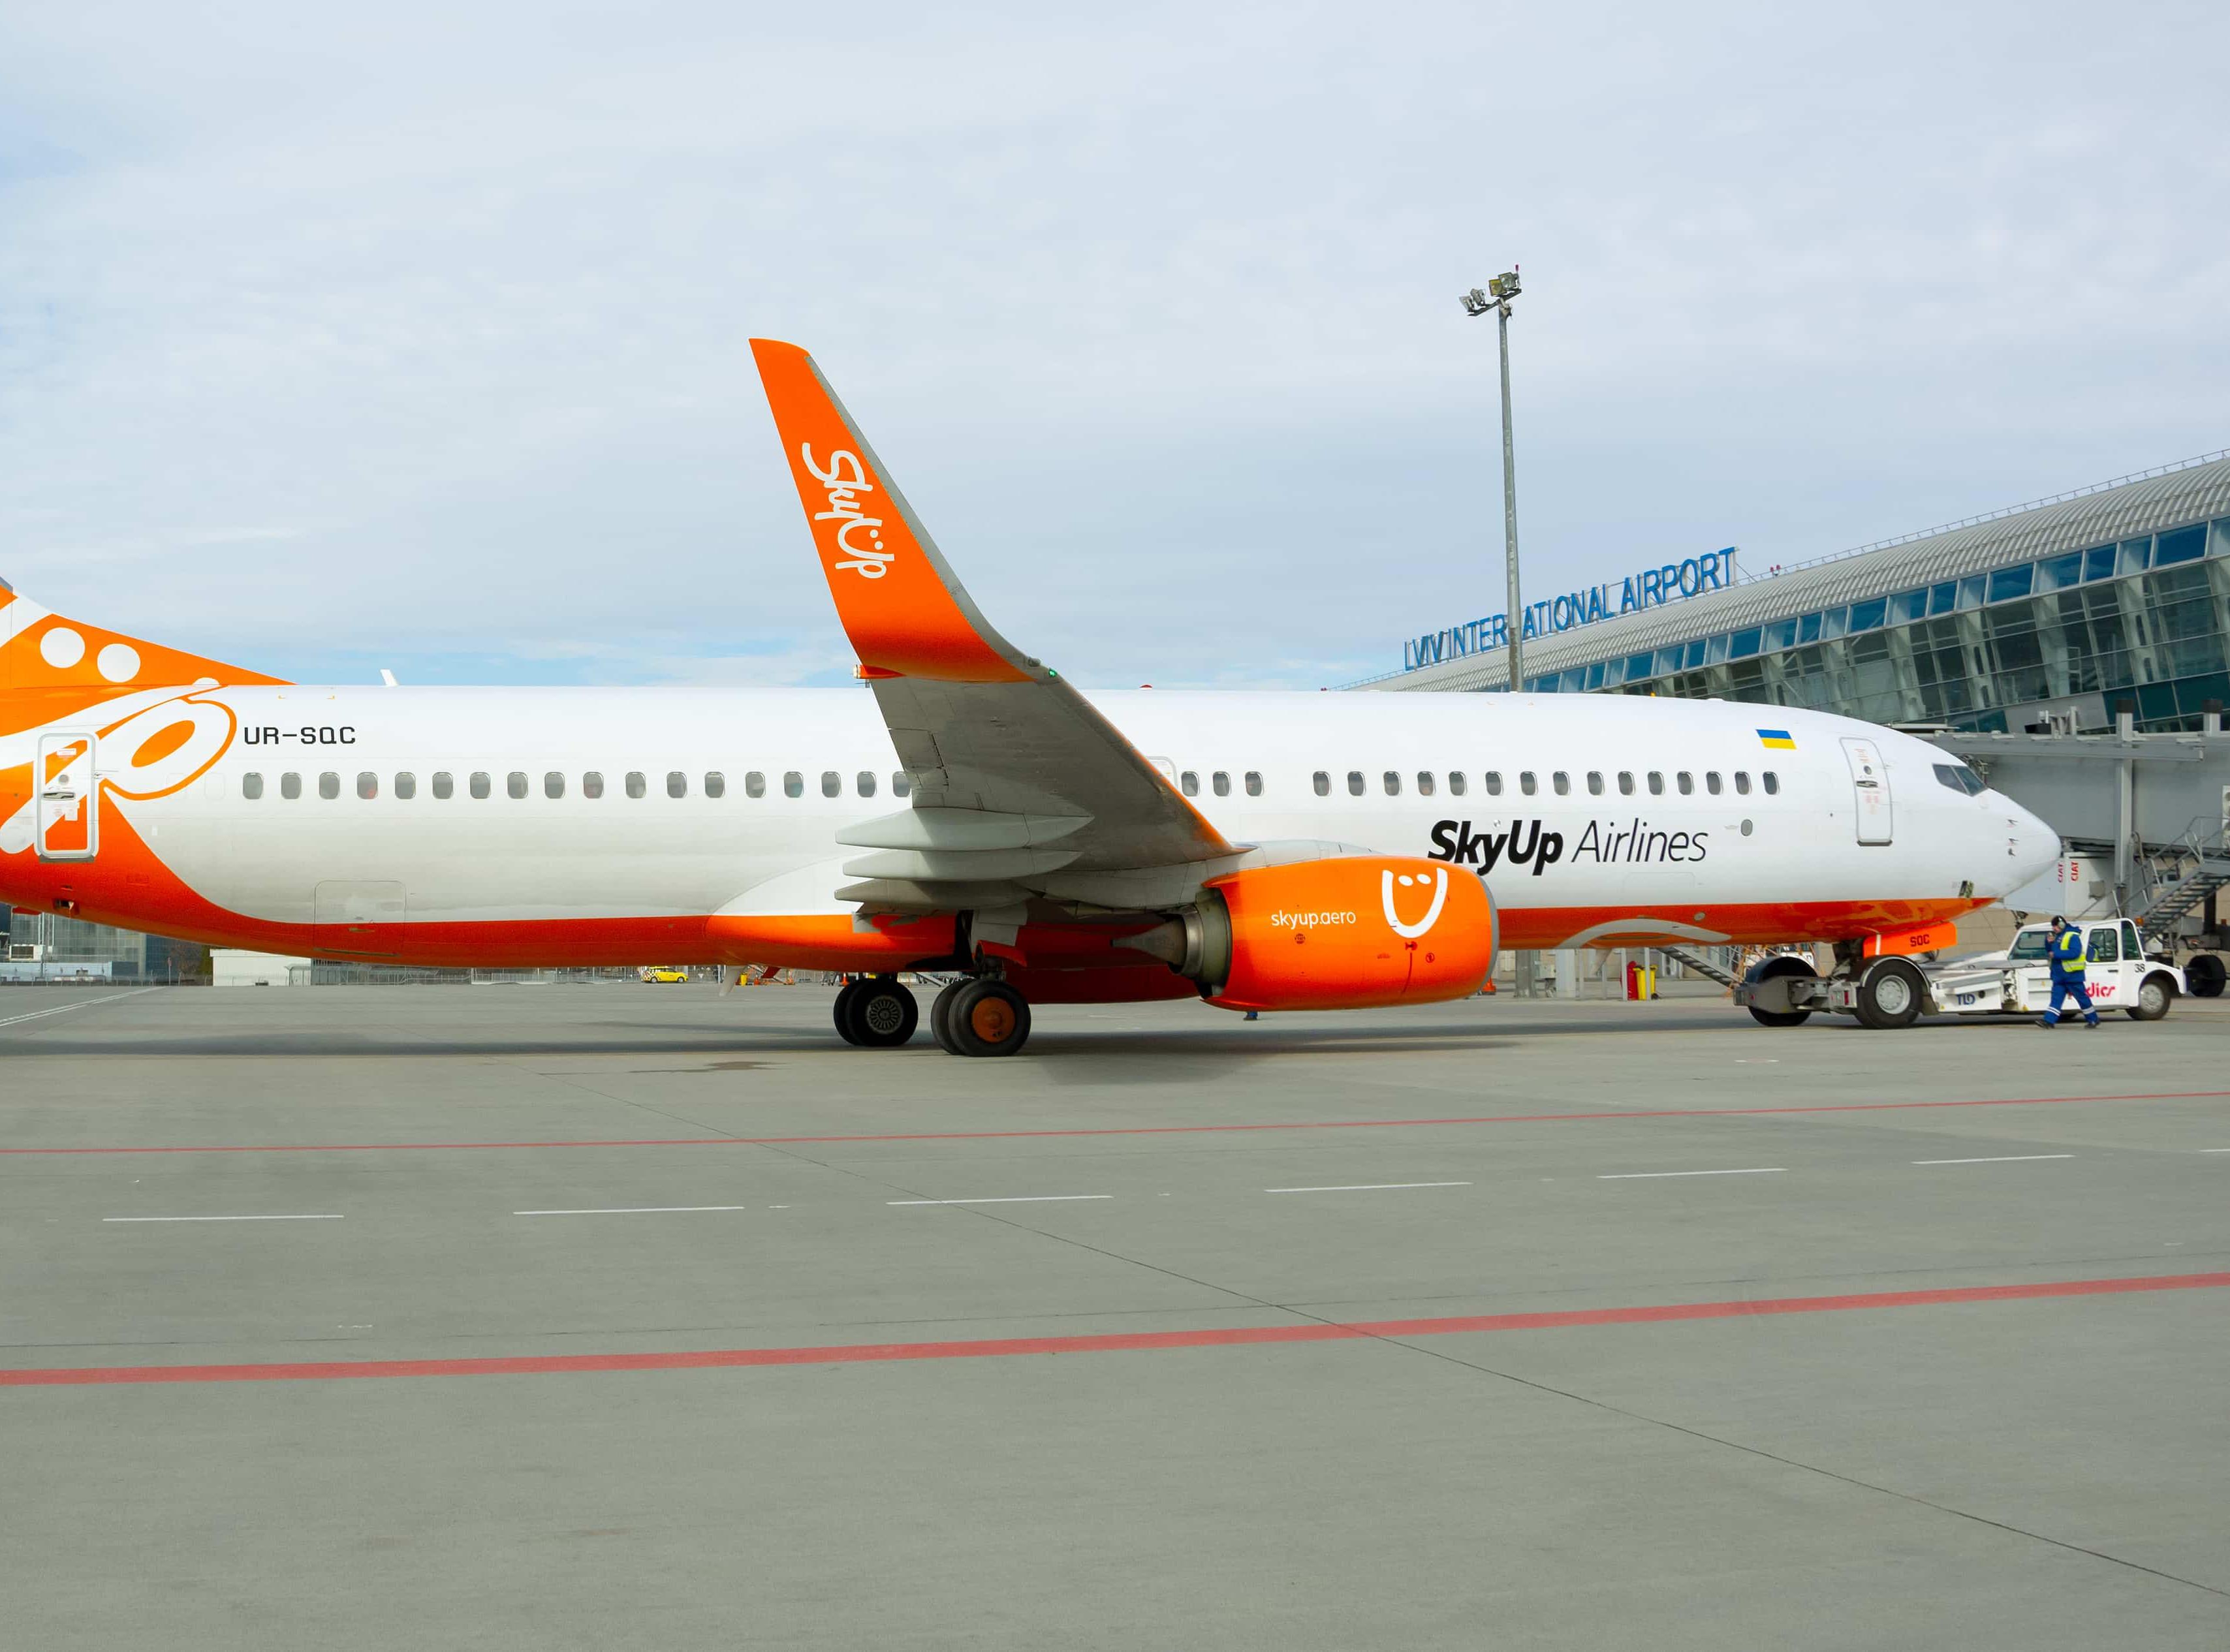 skyup-airlines-prizupinyaye-poloti-do-obyednanih-arabskih-emirativ